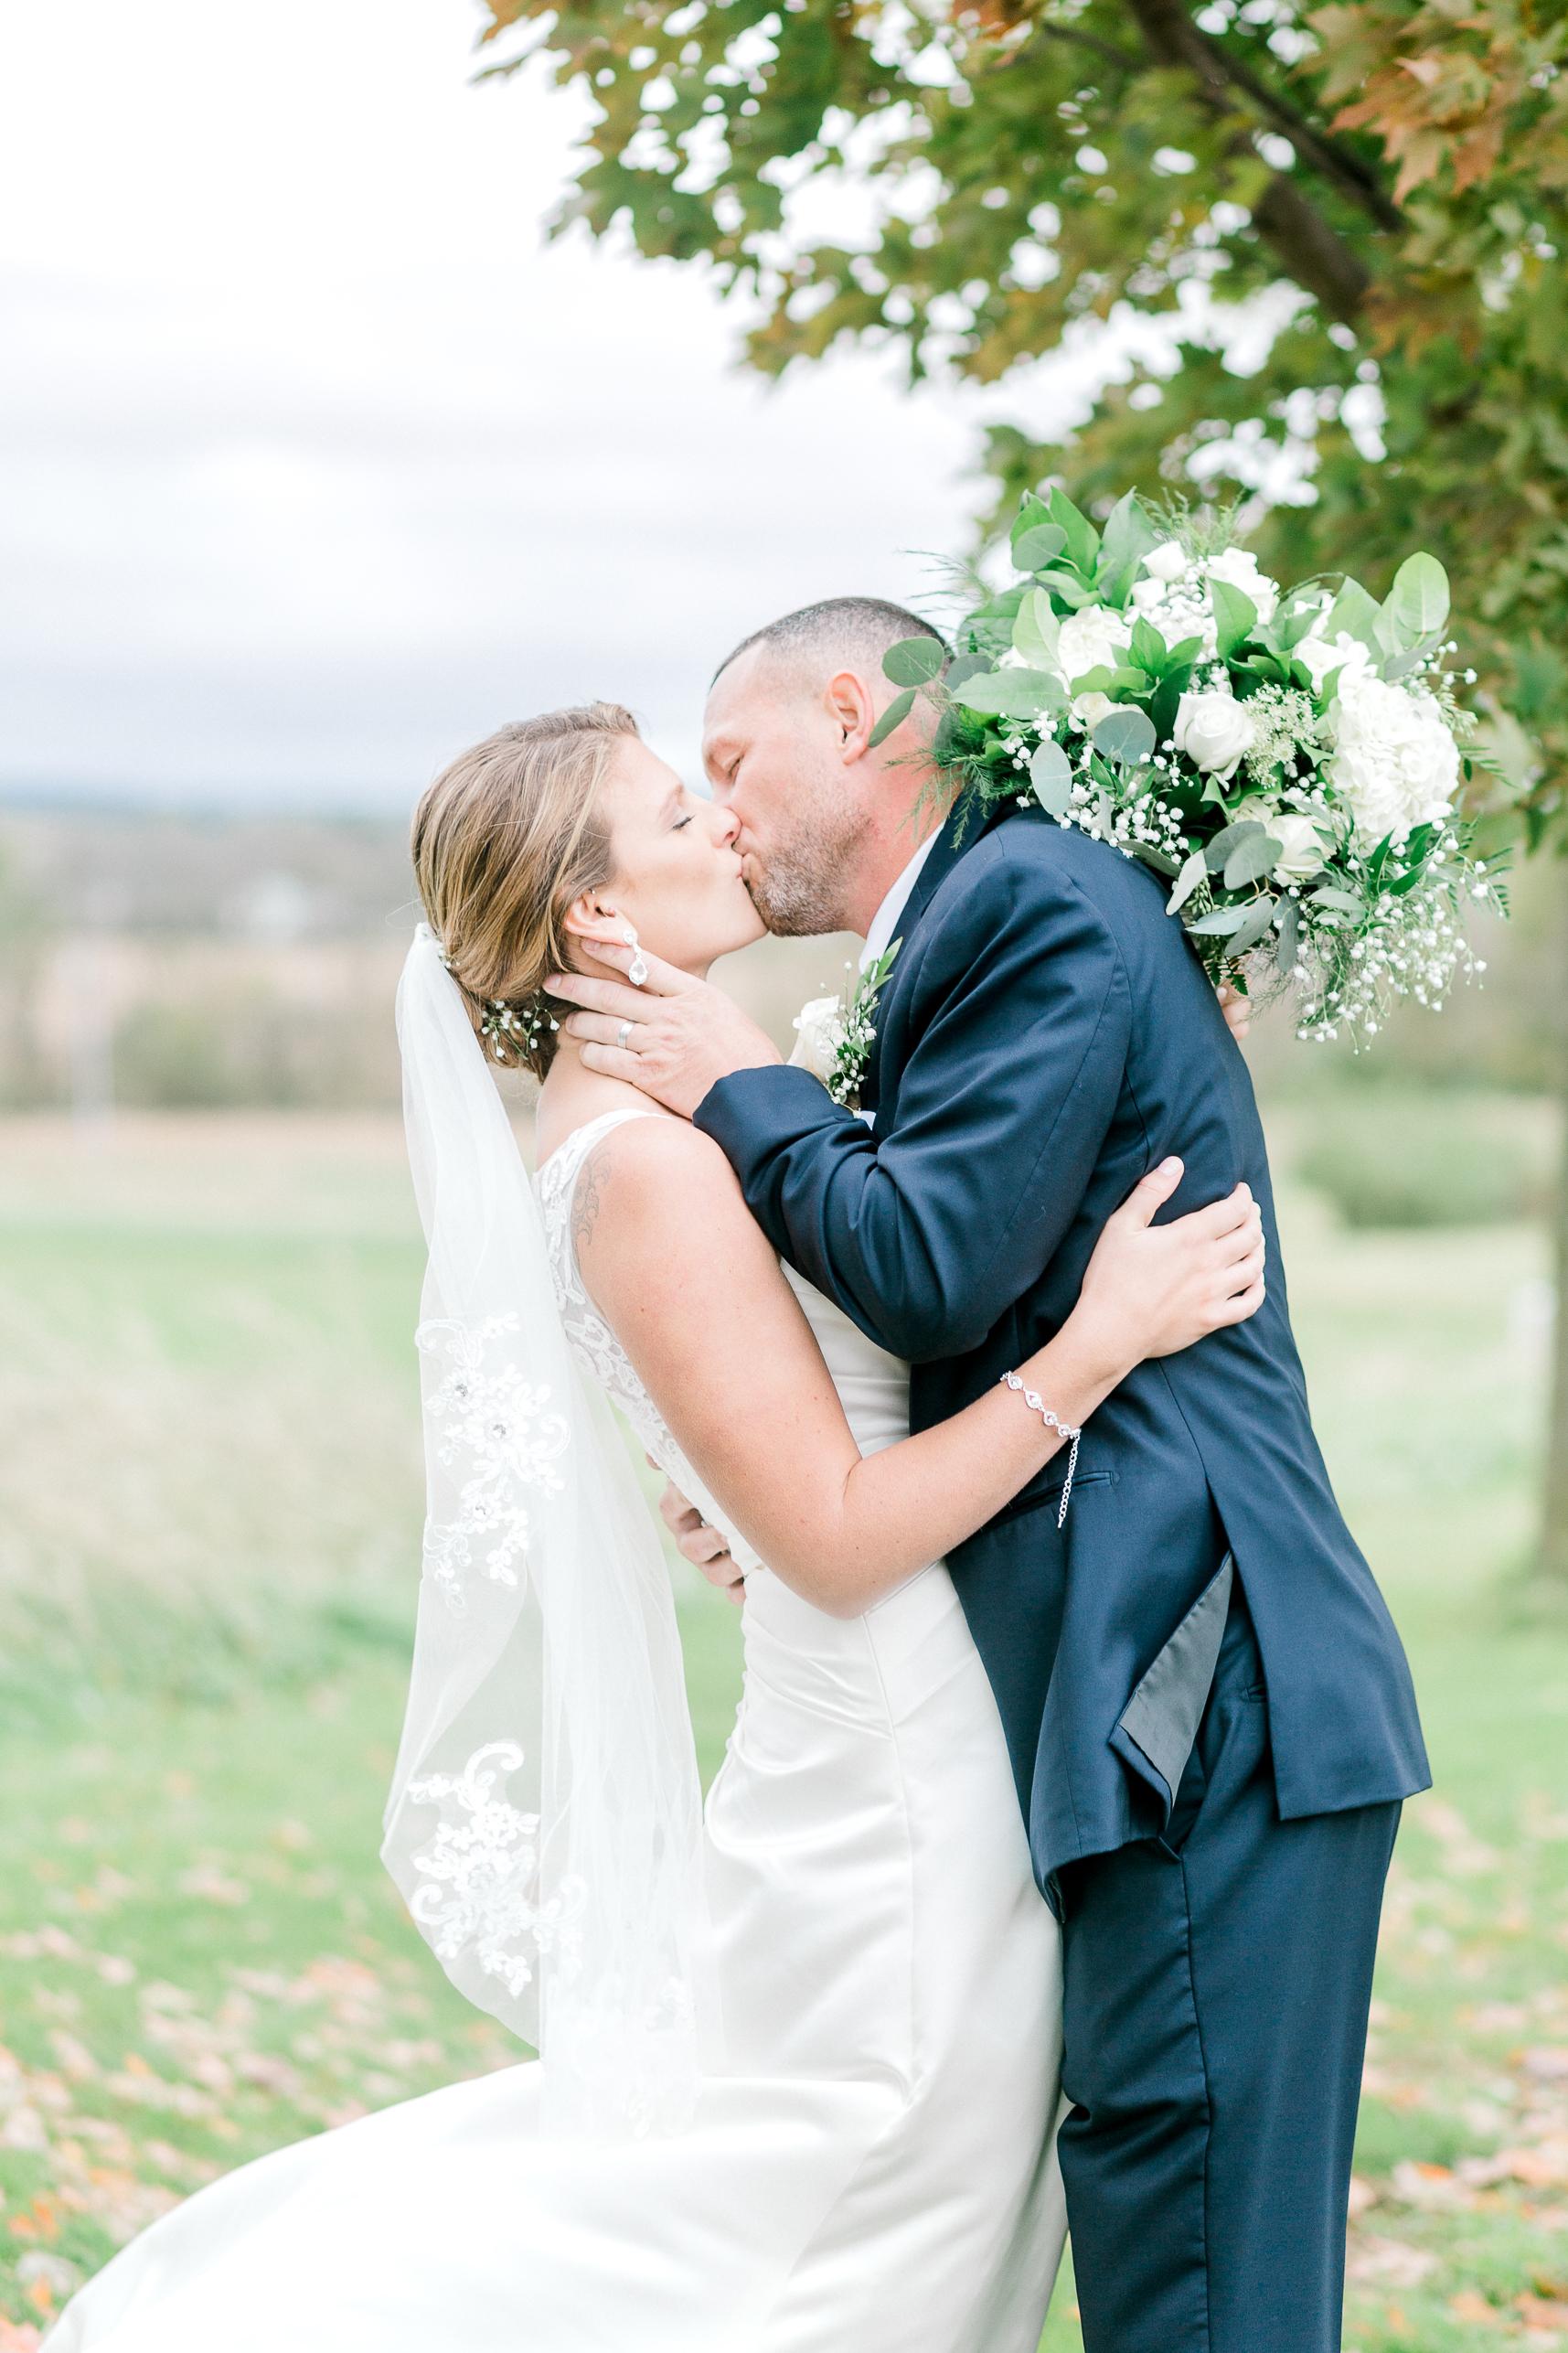 Pennsylvania October Fall Lehigh Valley wedding and lifestyle photographer Lytle Photo Co (88 of 167).jpg